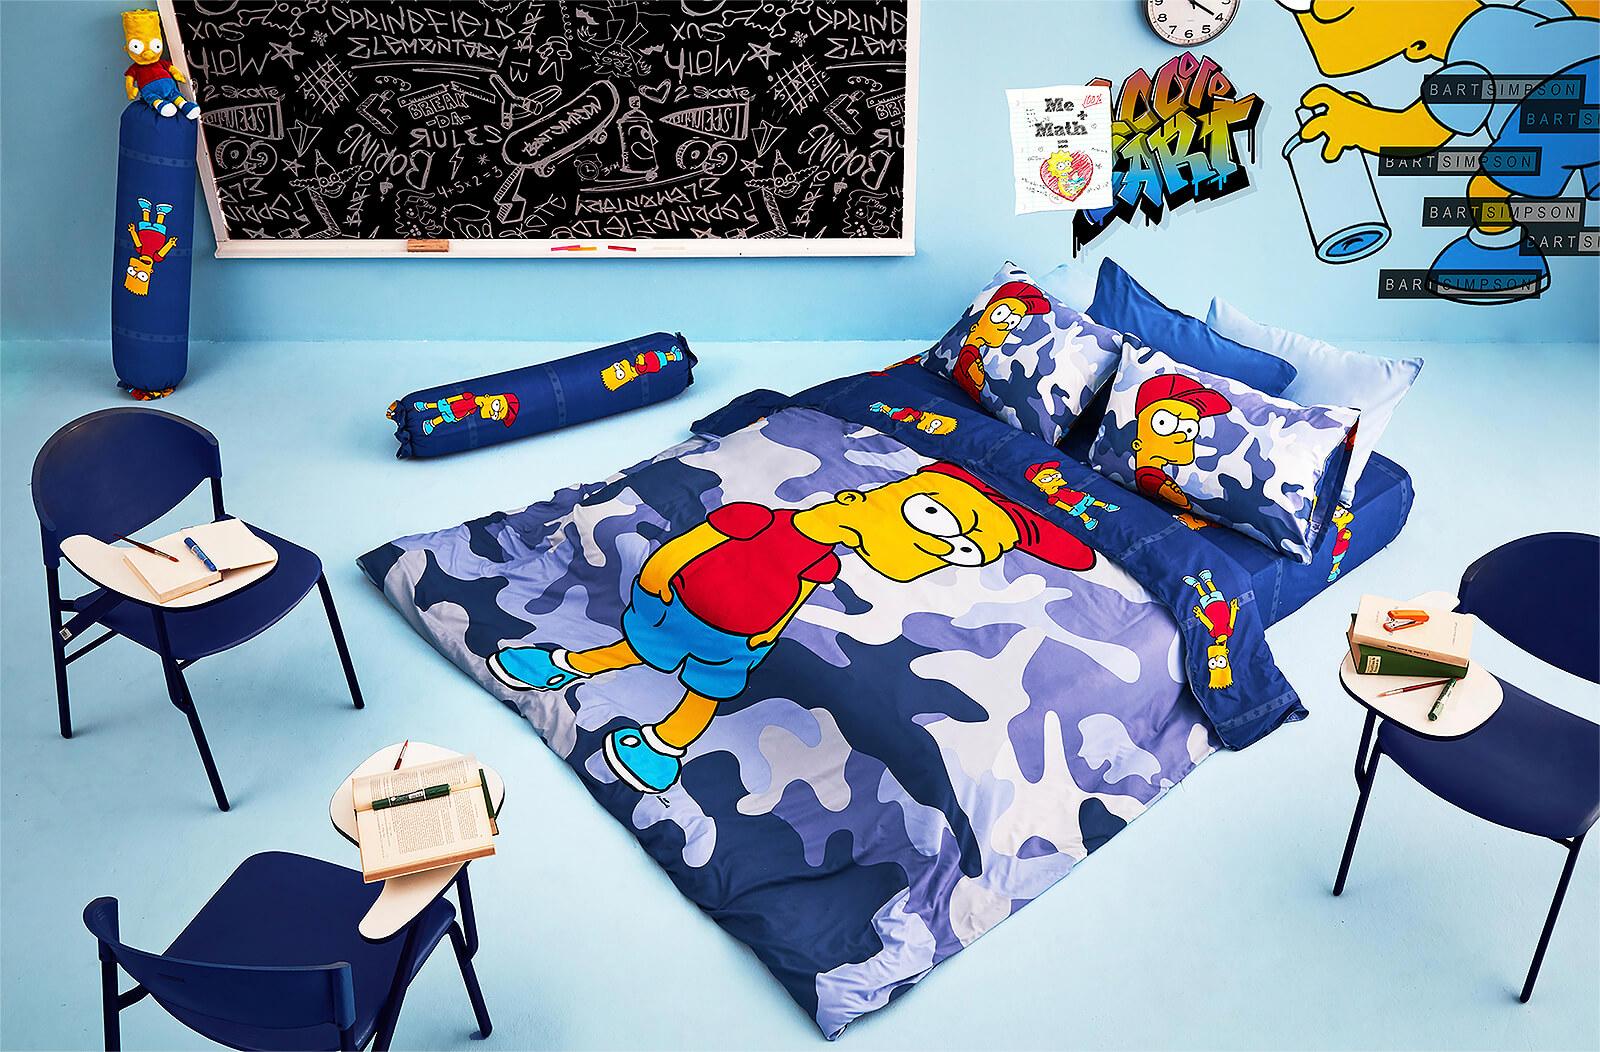 Lotus รุ่น Pop-art The Simpsons ชุดผ้าปูที่นอน LI-SS-06